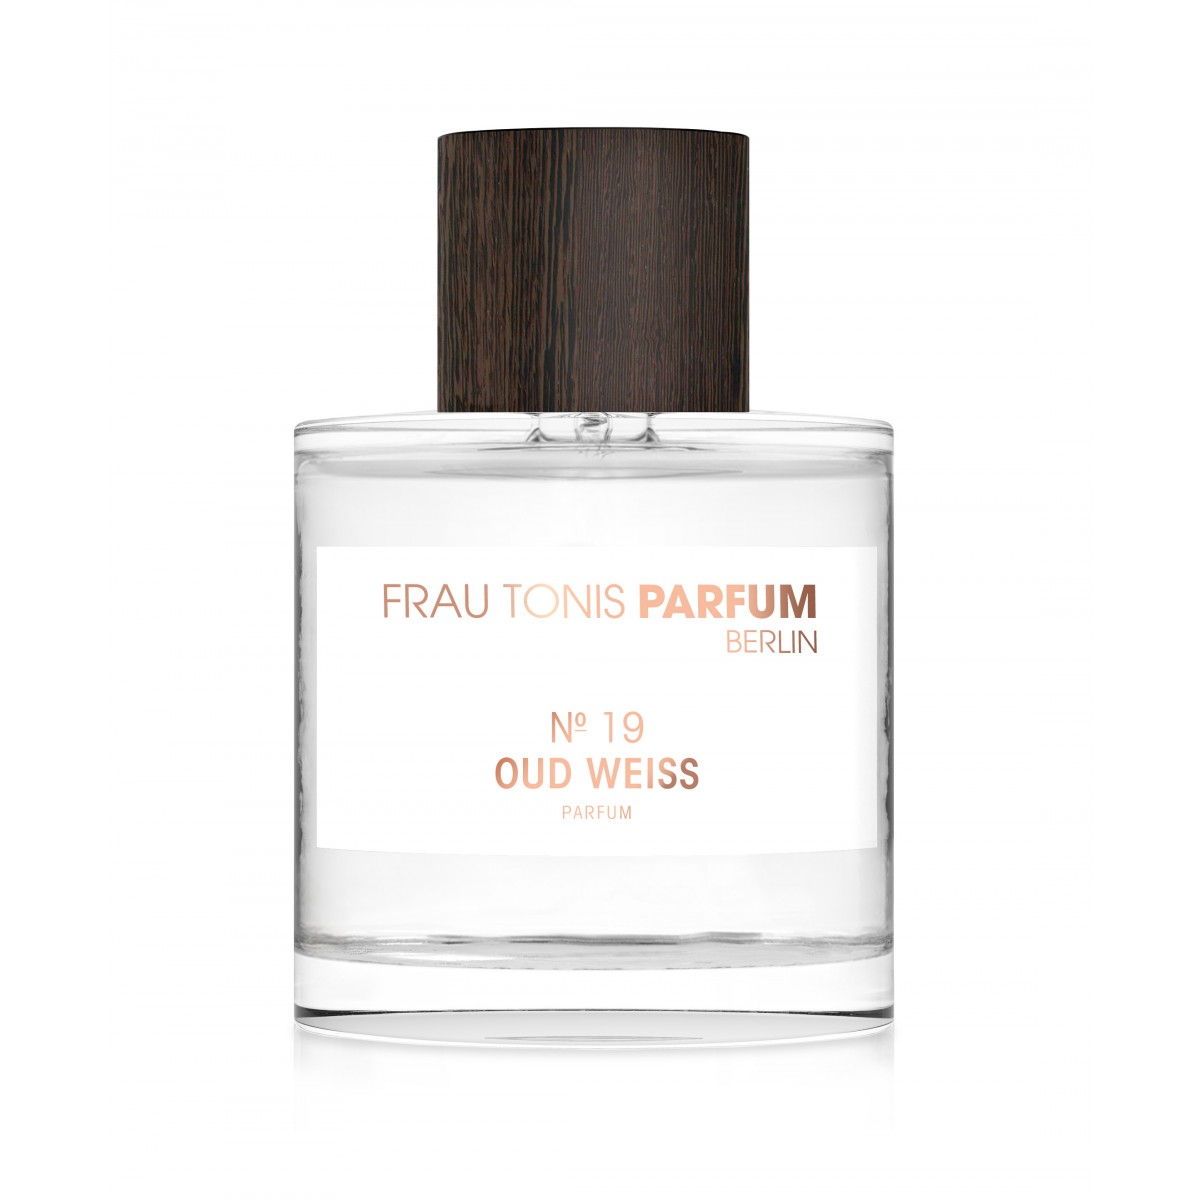 Frau Tonis Parfum No. 19 OUD WEISS (Sinnlich, Elegant, Kostbar), 50 ml Parfum